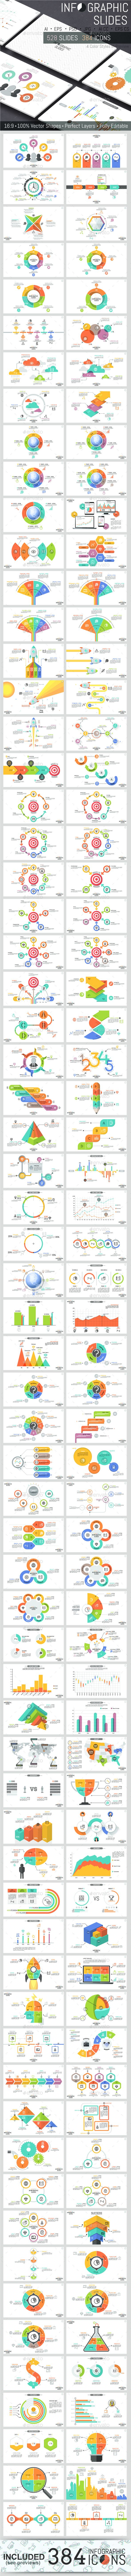 Infographic Slides - Infographics